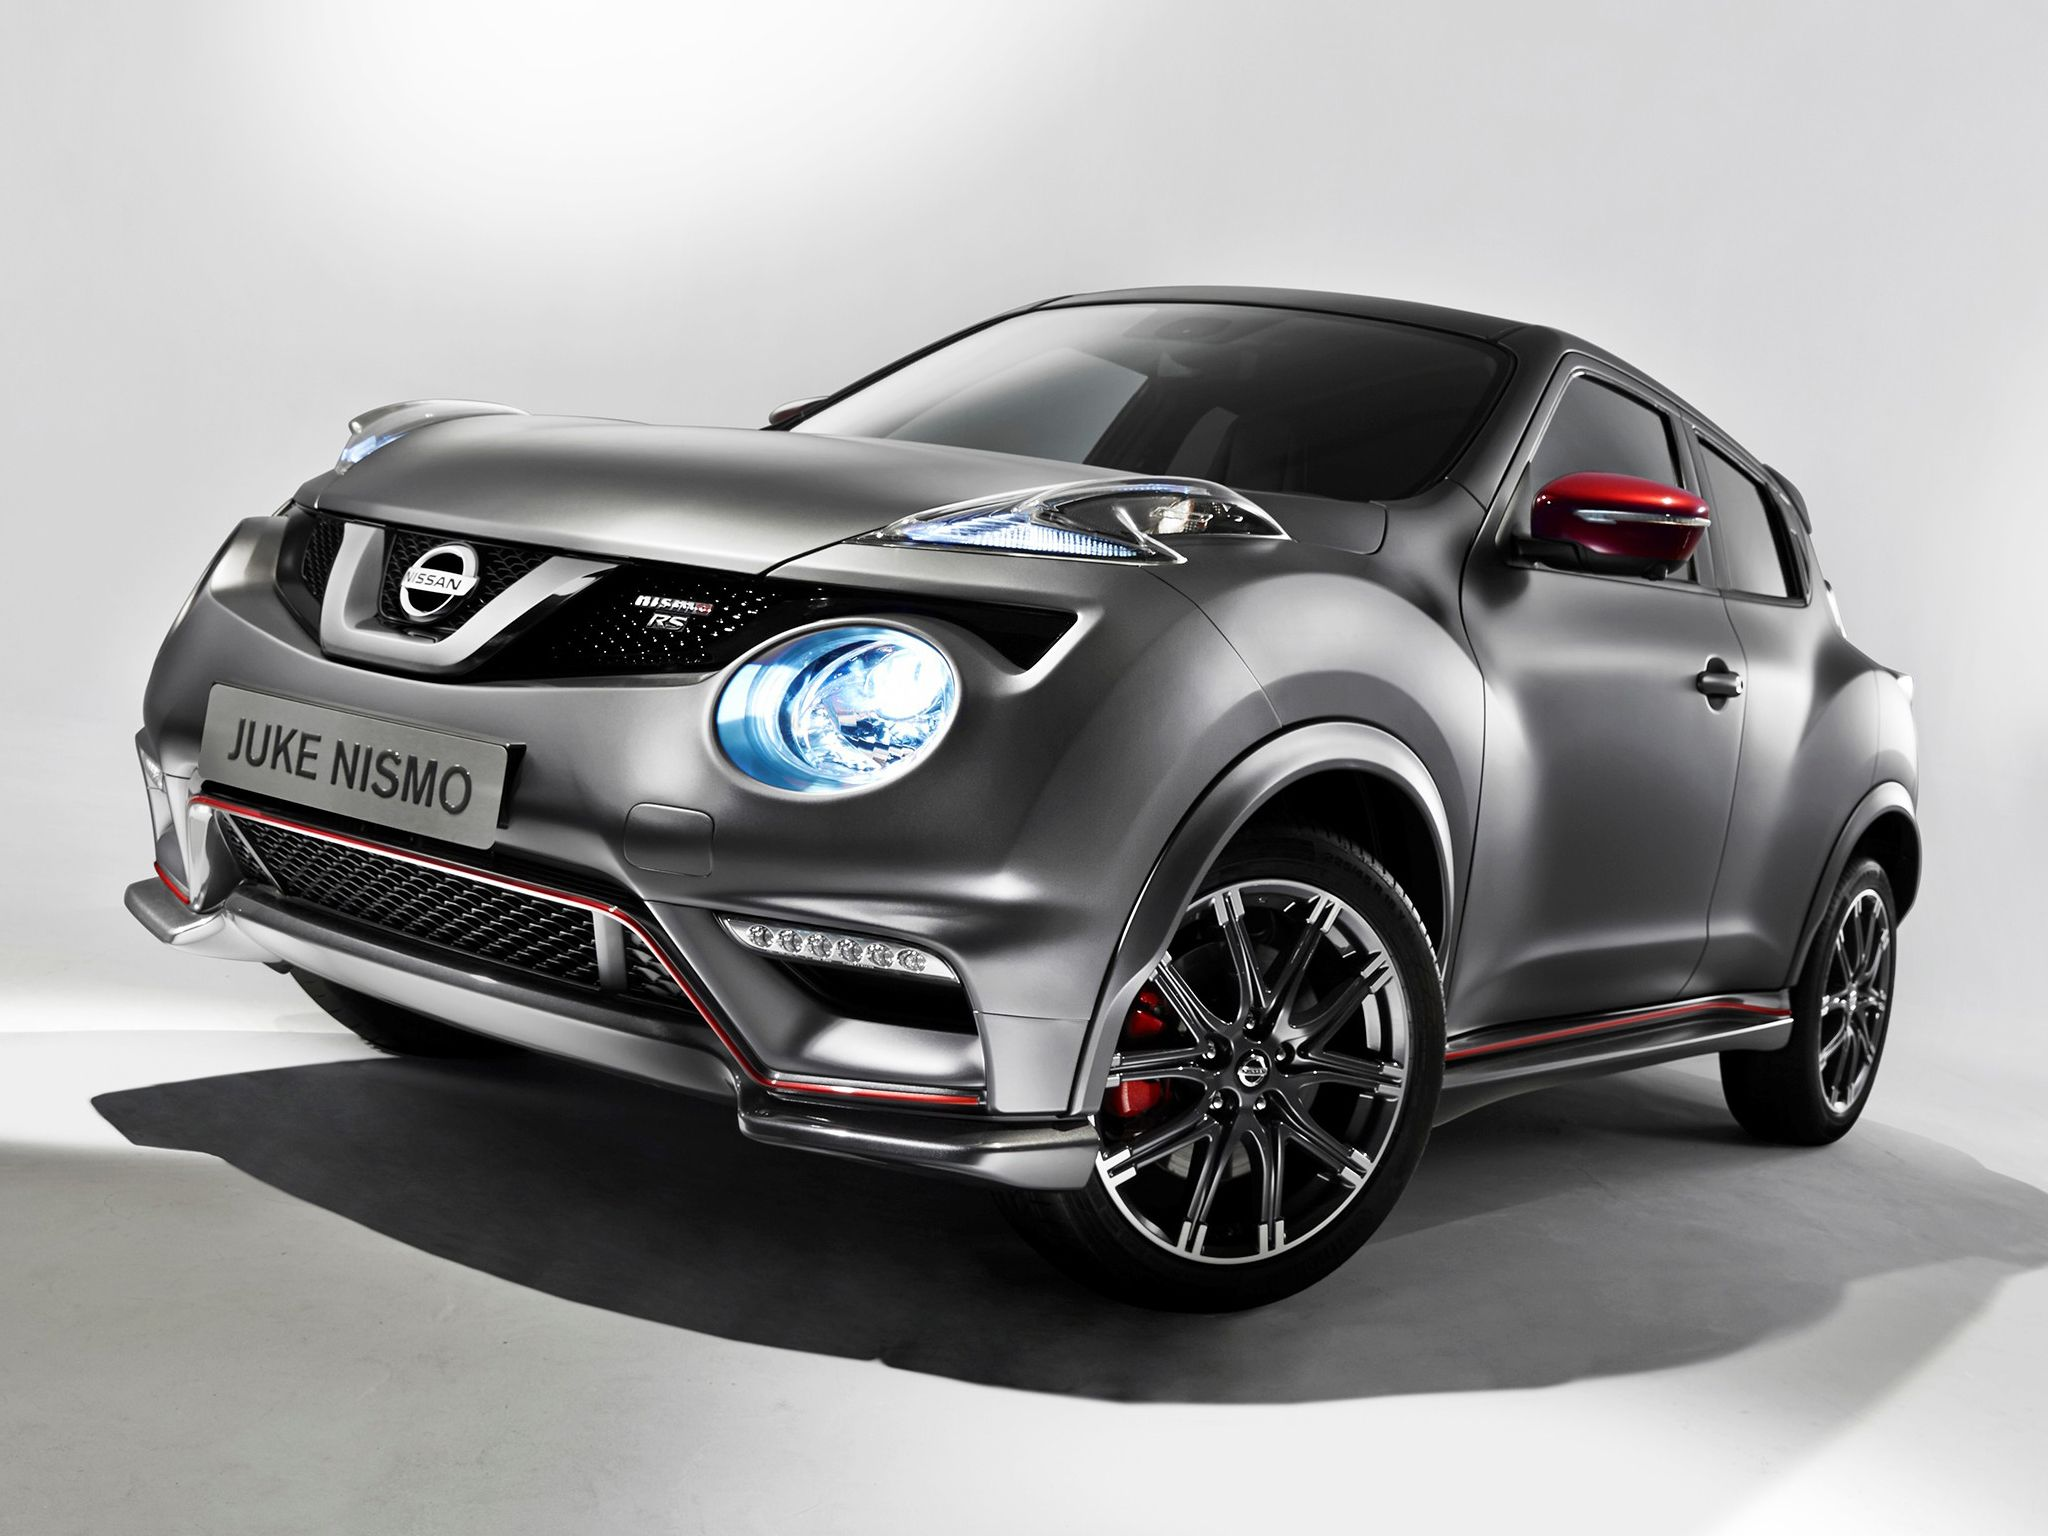 2014 Nissan Juke Nismo Rs Nissan Juke Nissan Juke Nismo Nissan